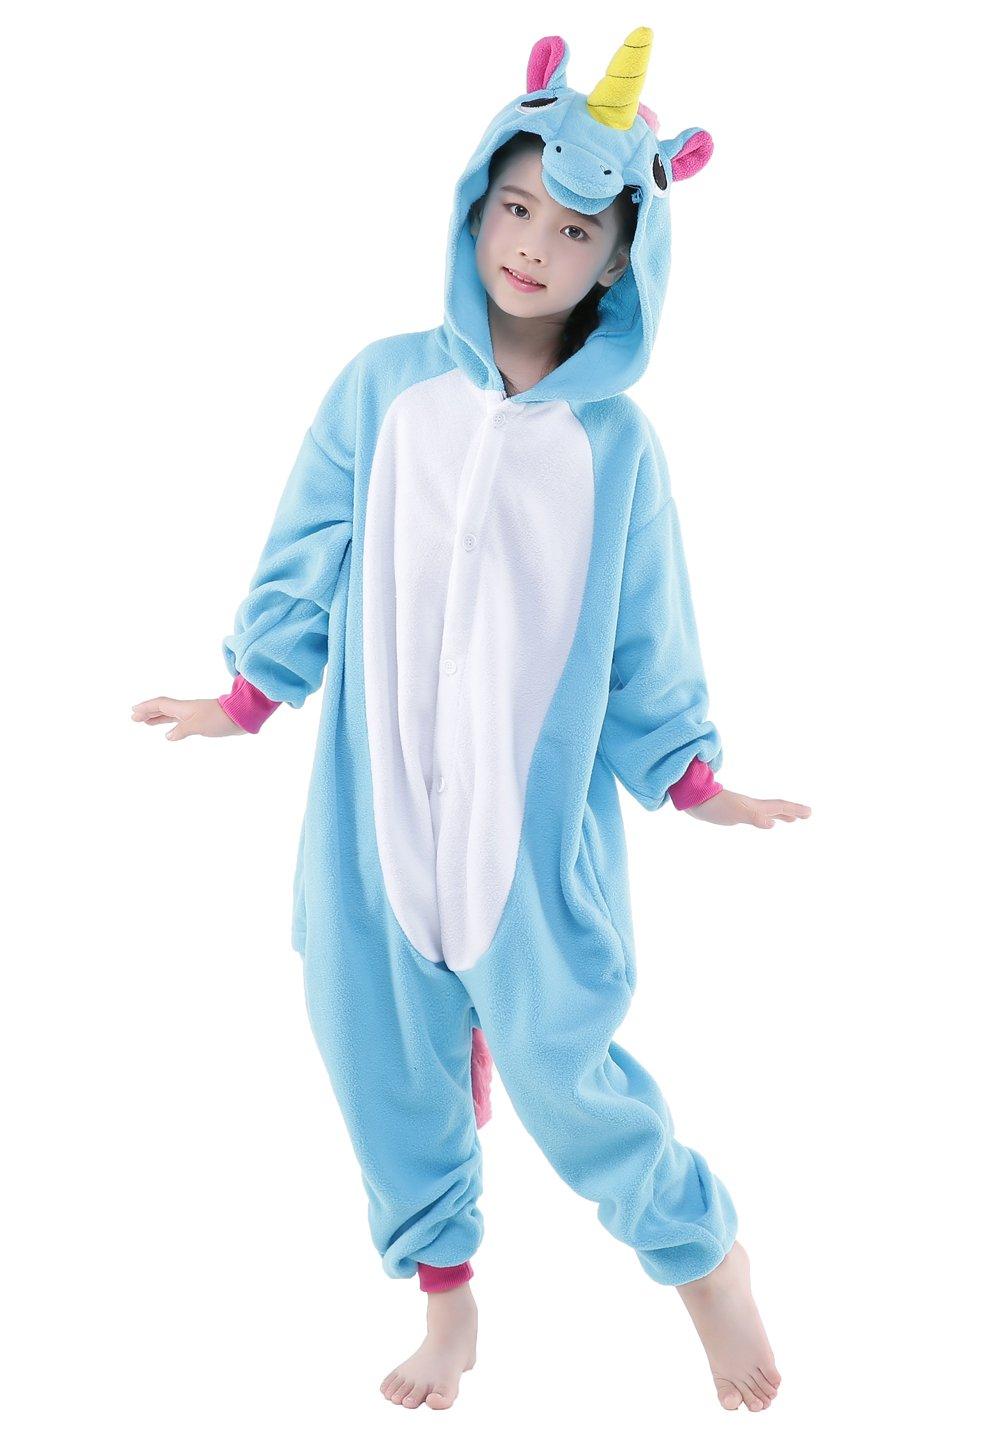 newcosplay christmas costumes unicorn pajamas kids onesies cosplay costumes